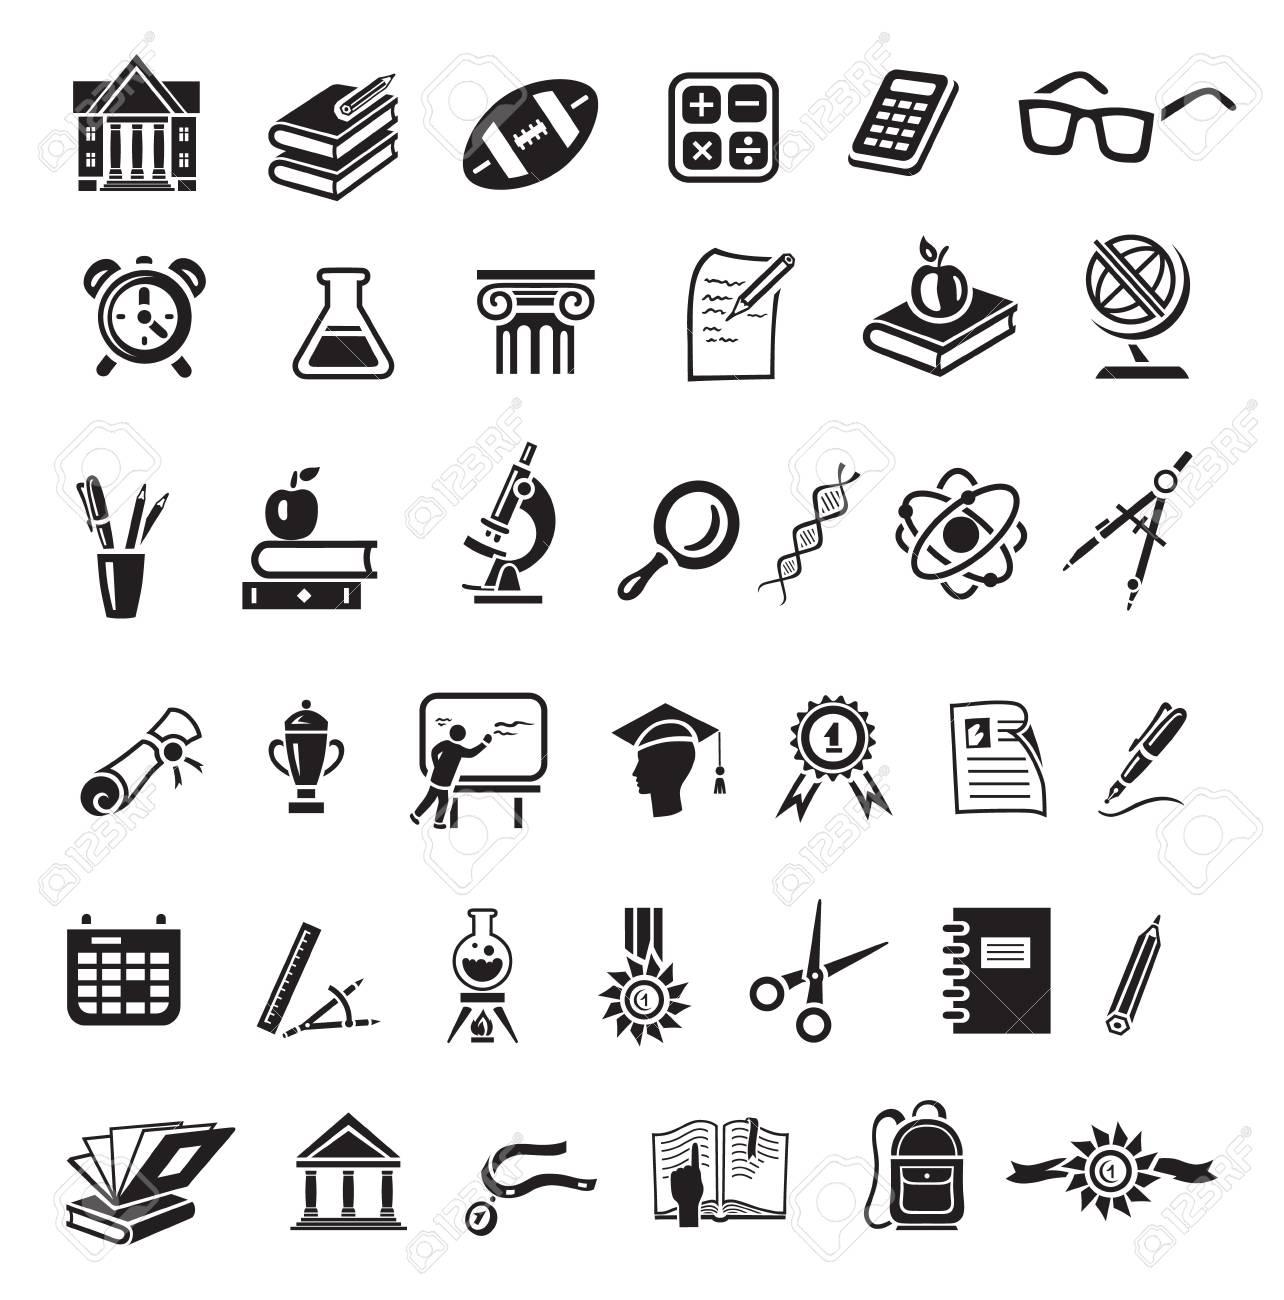 Education icon set in minimalist style. Black sign on white background. Books, globe, dna, scissors, bal, retort, beaker, calculator, cup winner, alarm clock, apple, spectacles - 108574061